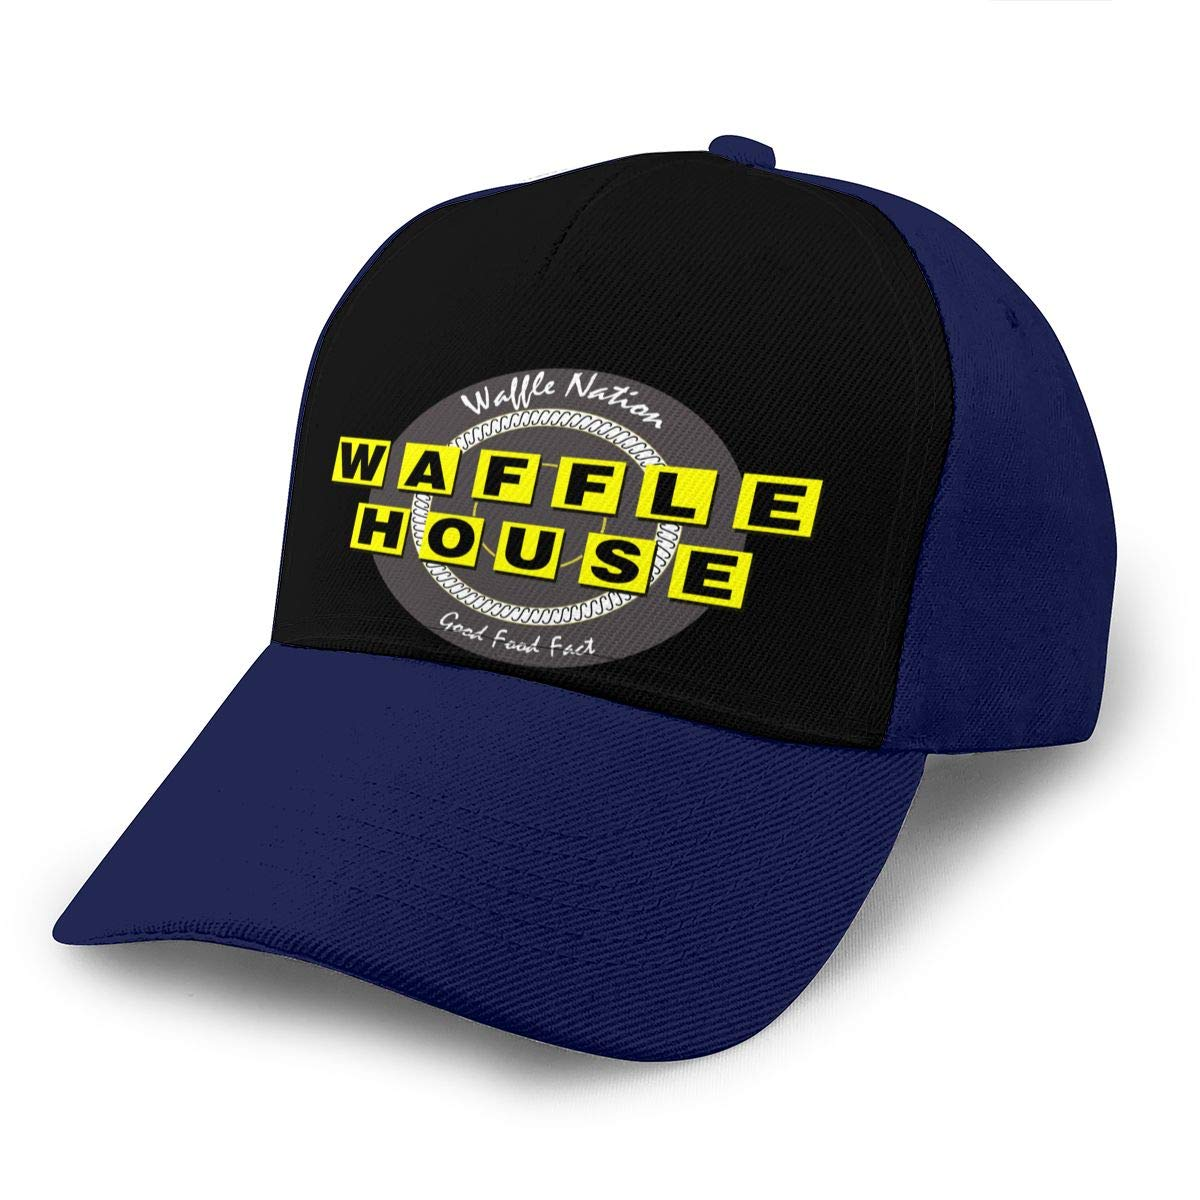 Adjustable Women Men Waffle-House Print Baseball Cap Flat Brim Cap Hats Hip Hop Snapback Sun Hat Boys Girls Navy by Apolonia